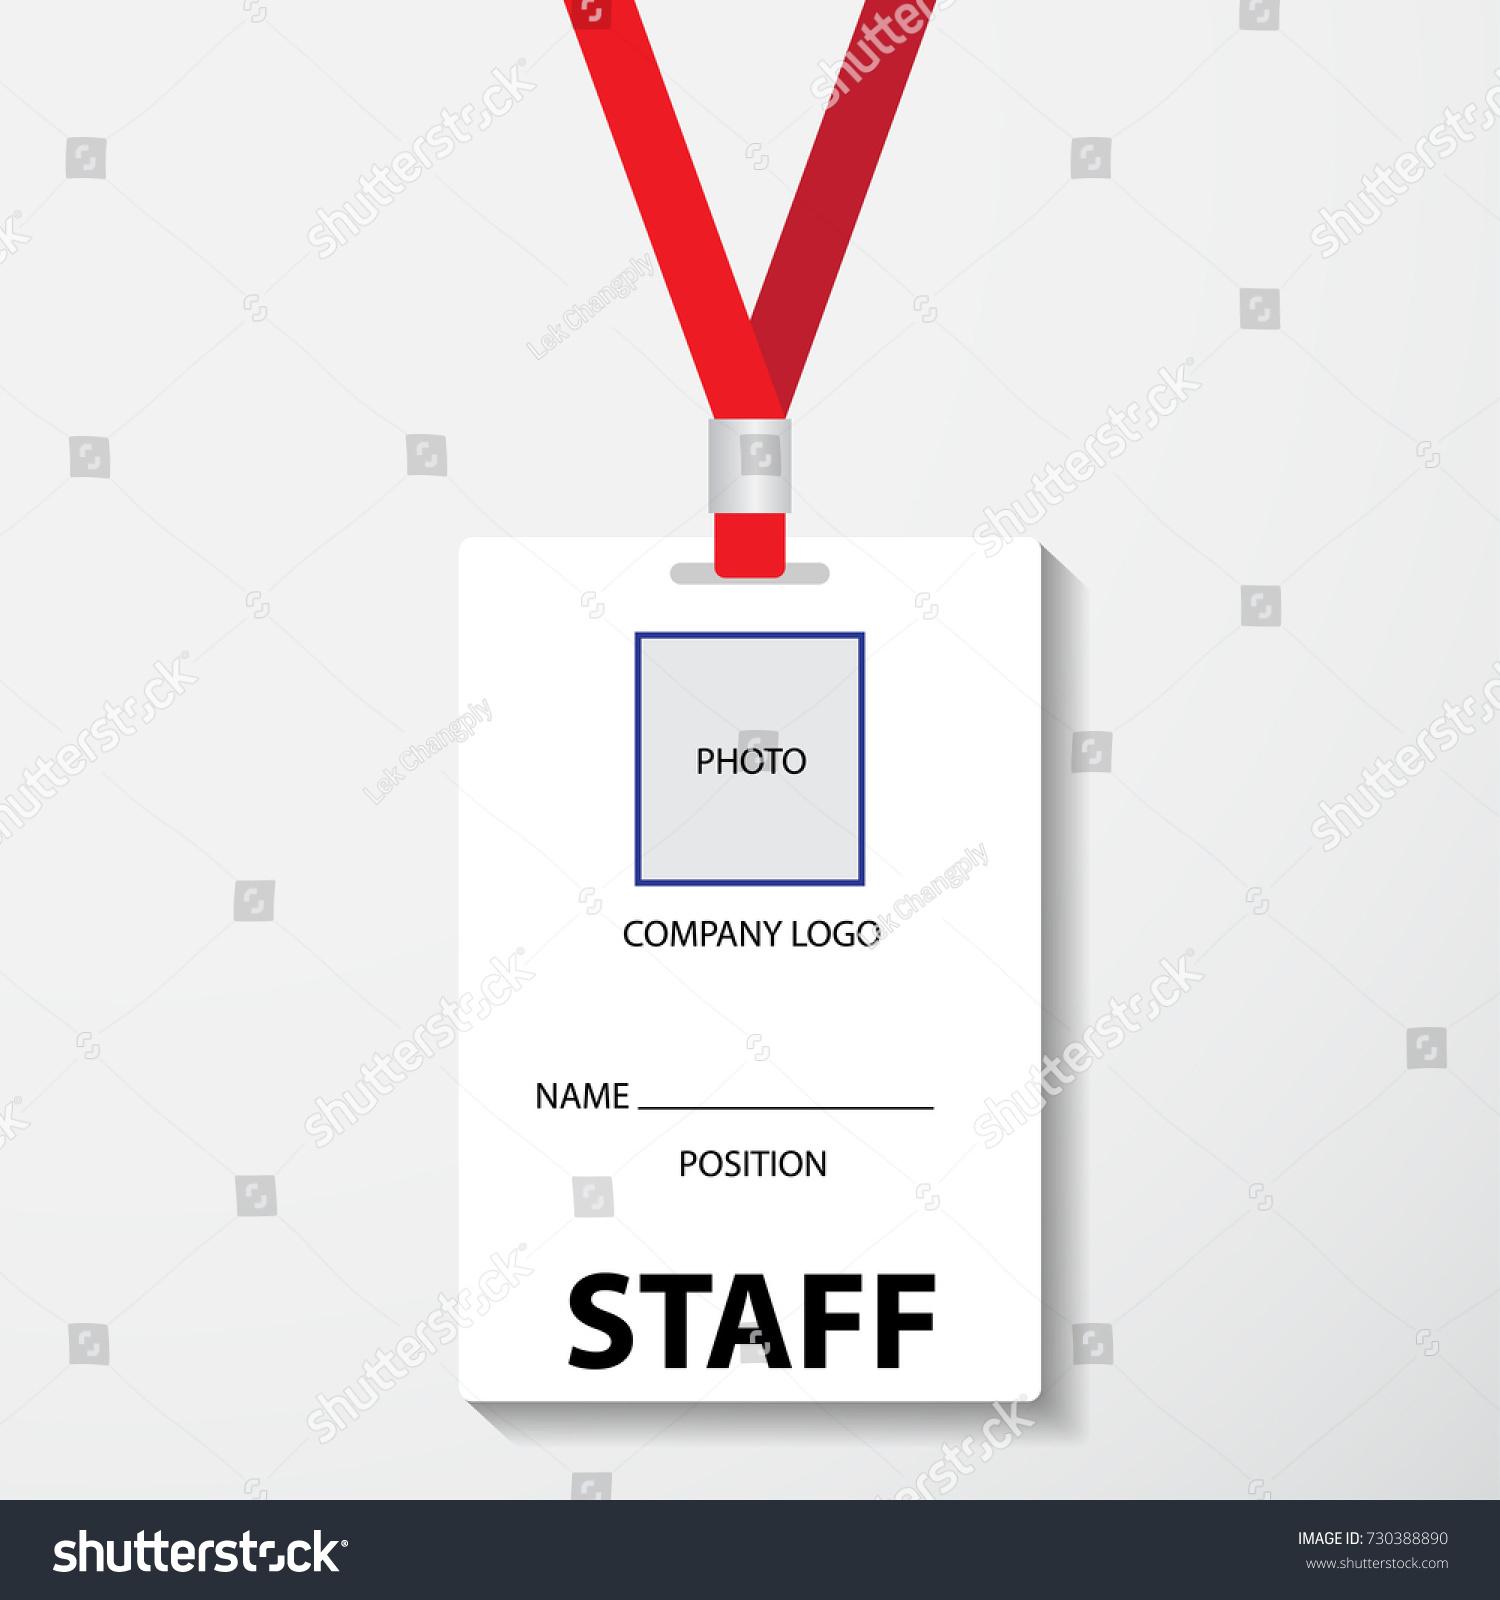 blank template staff employee identification card stock vector